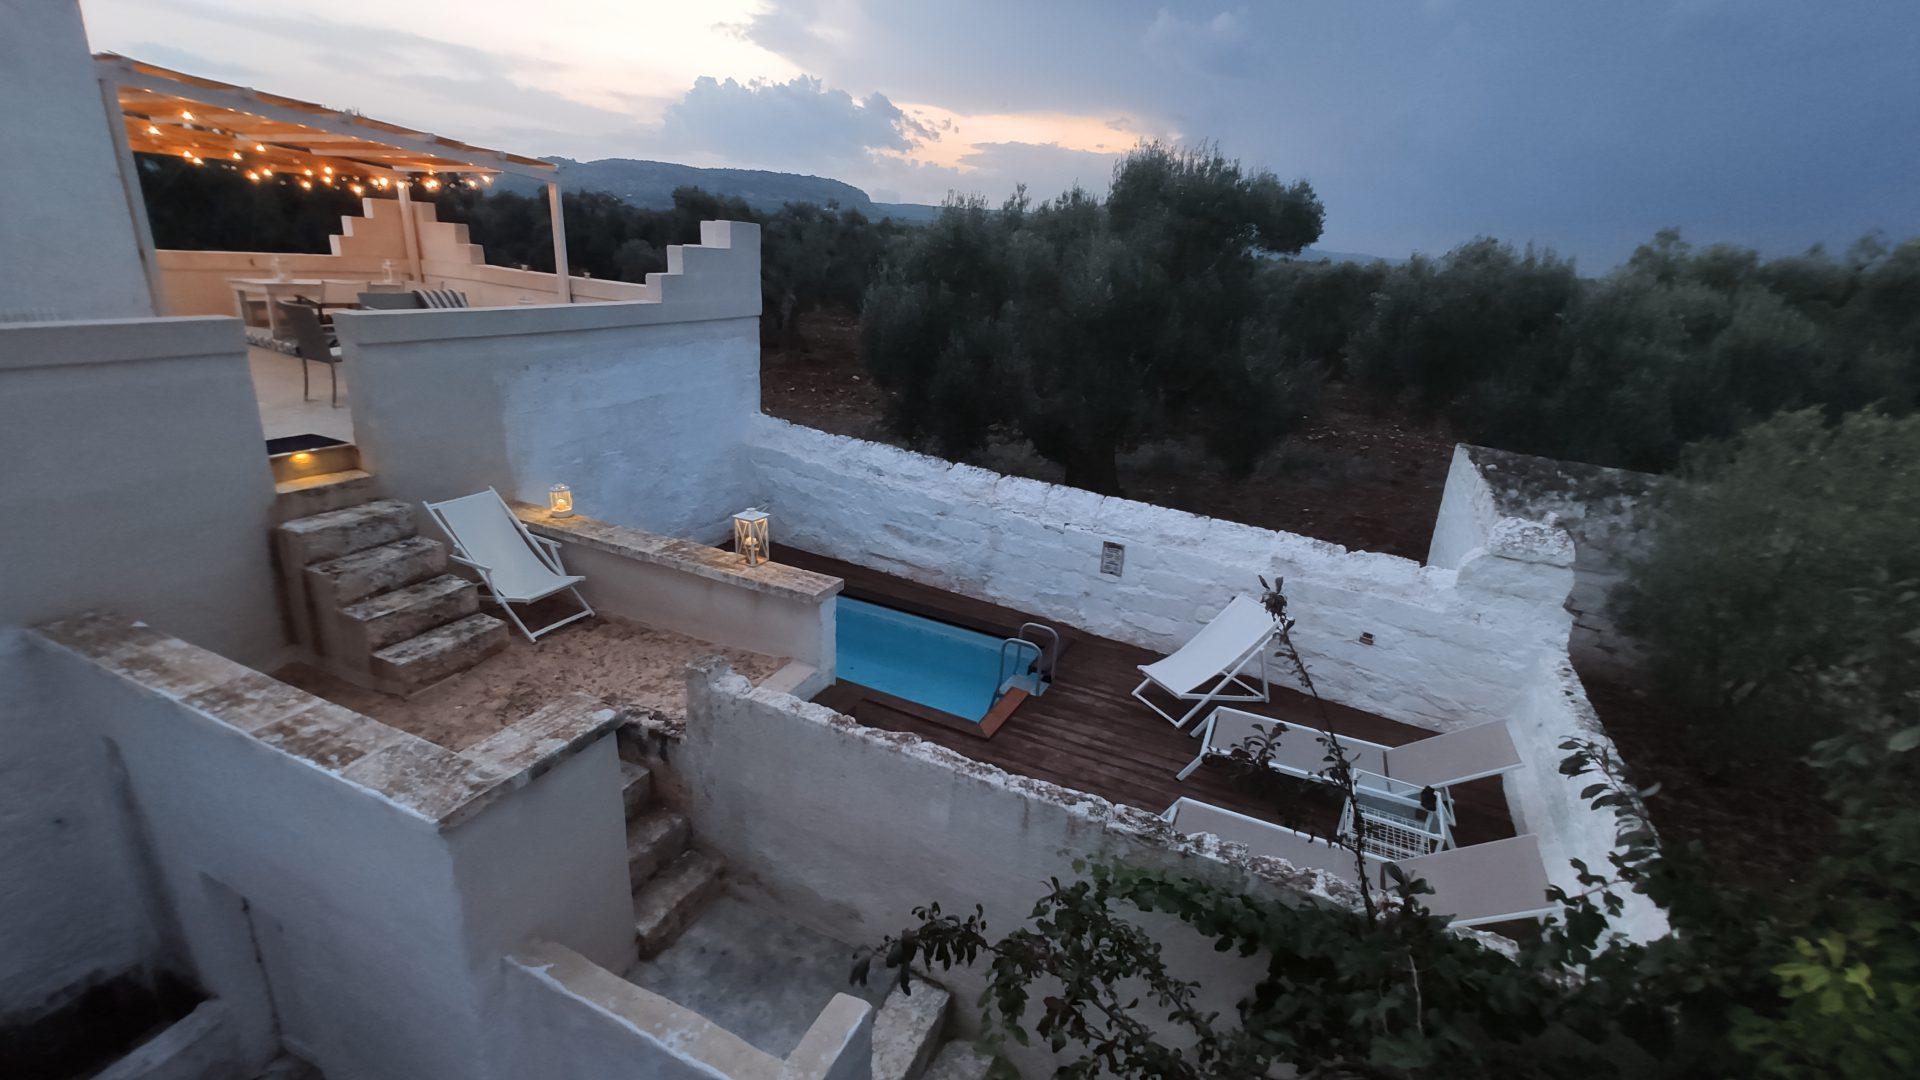 Panorama of Swimming pool deck, walls and olive groves at Pool at Masseria Bellavista historic holiday vacation rental villa in ostuni puglia seaview at dusk